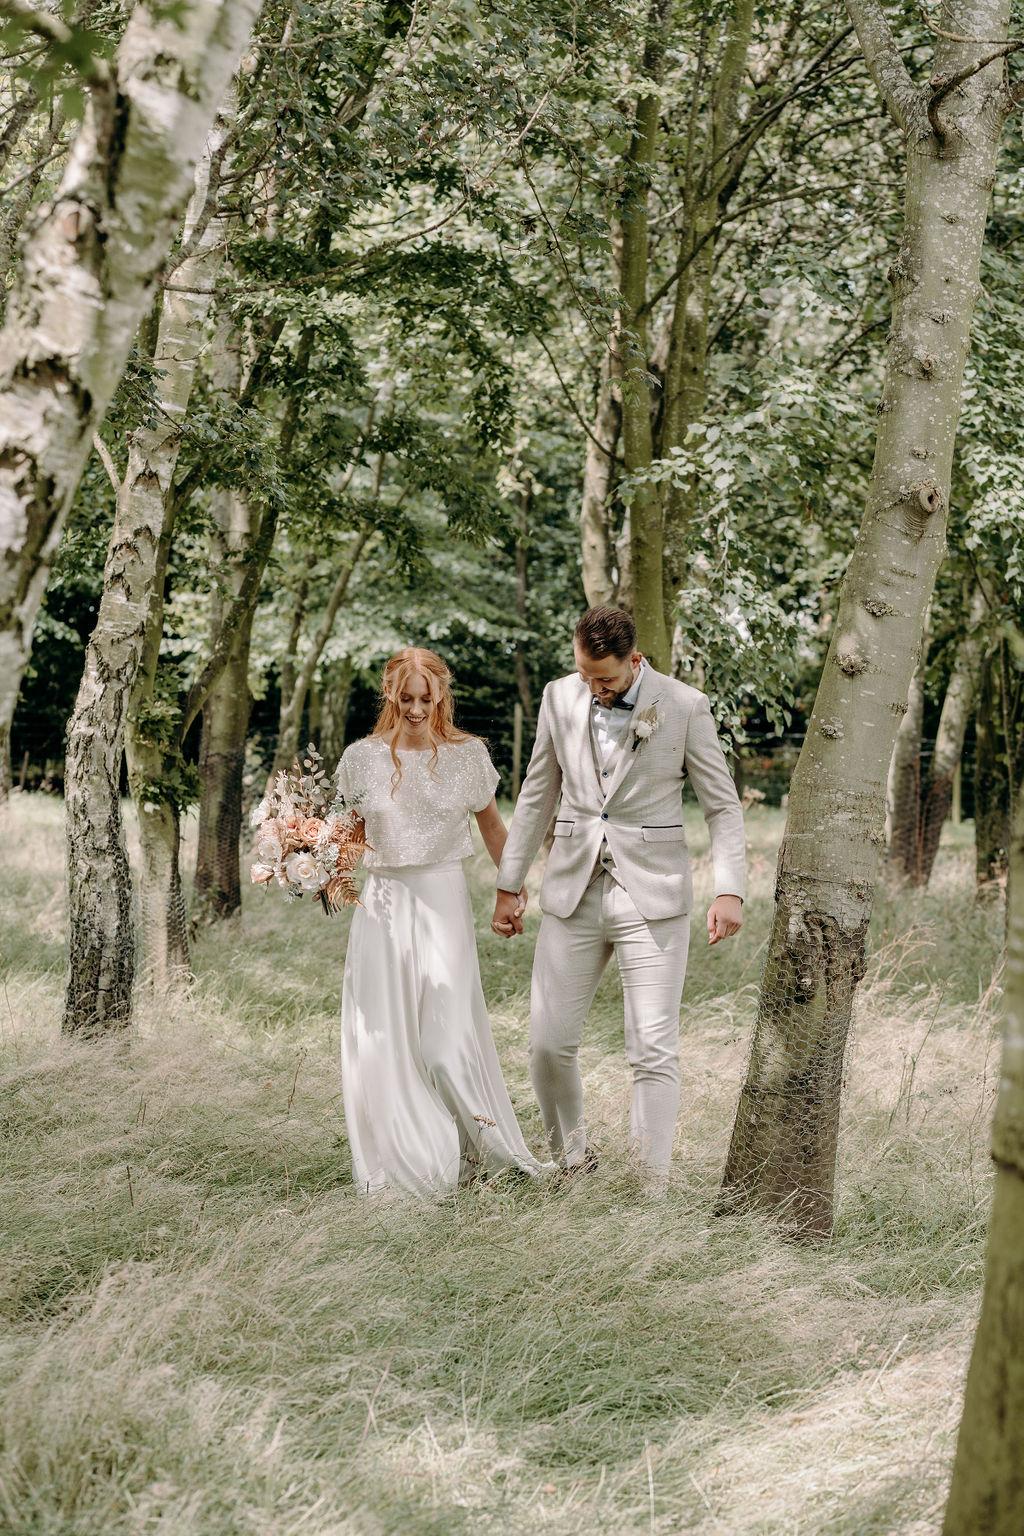 sustainable boho wedding - bohemian micro wedding - elopement photography - eco friendly wedding - unconventional wedding